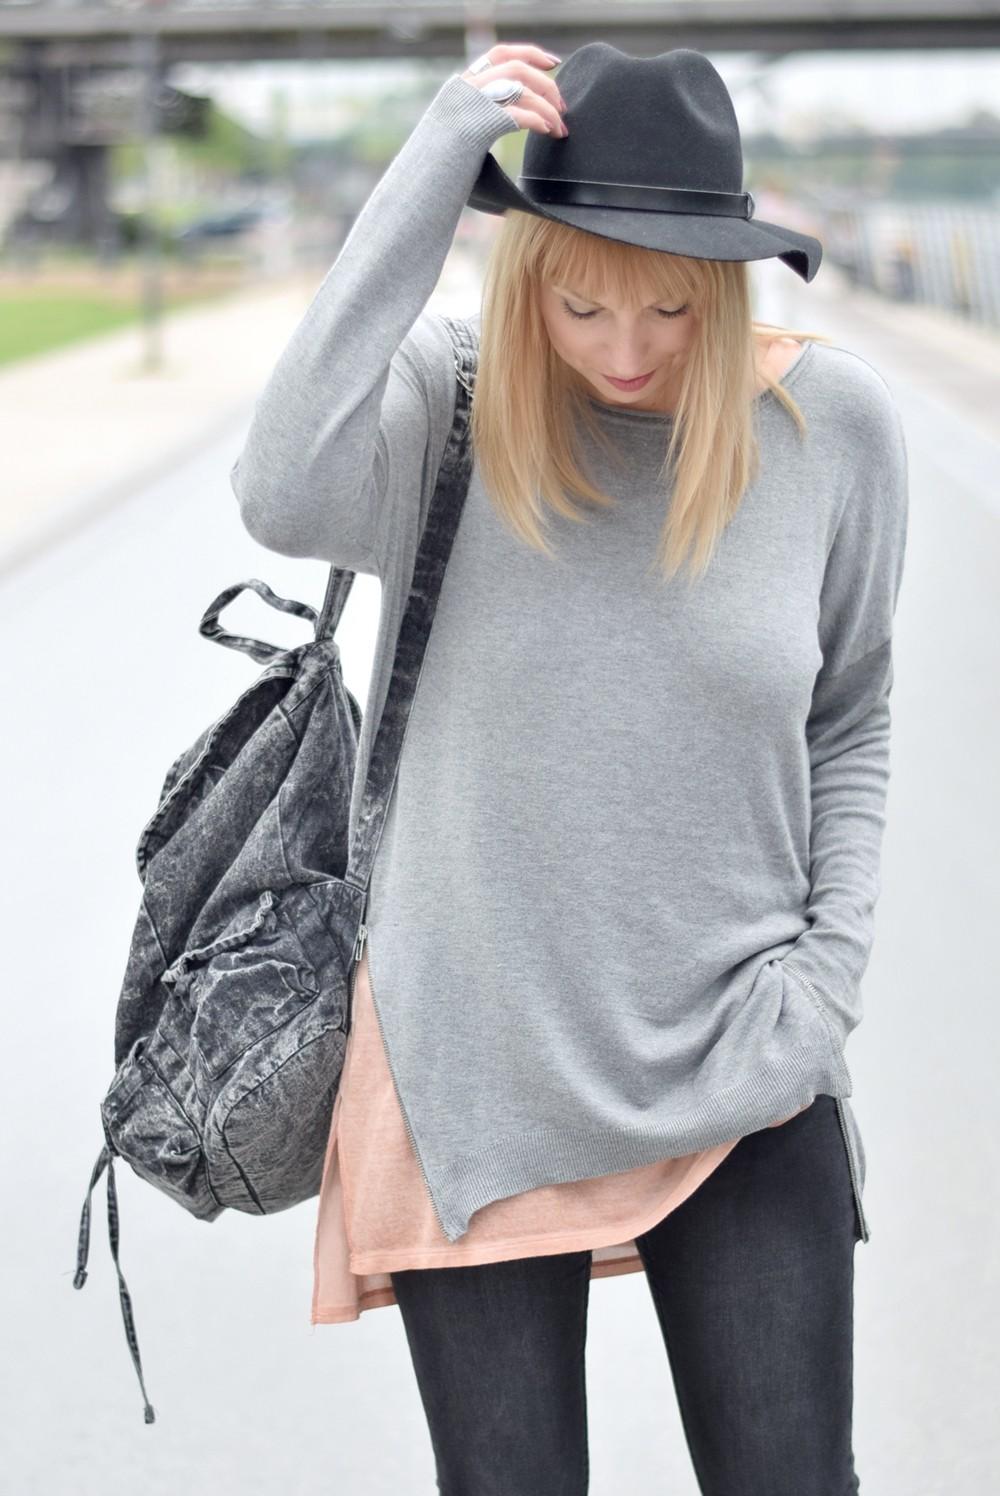 Puma Vashtie Outfit grau Jeans Sweater 13